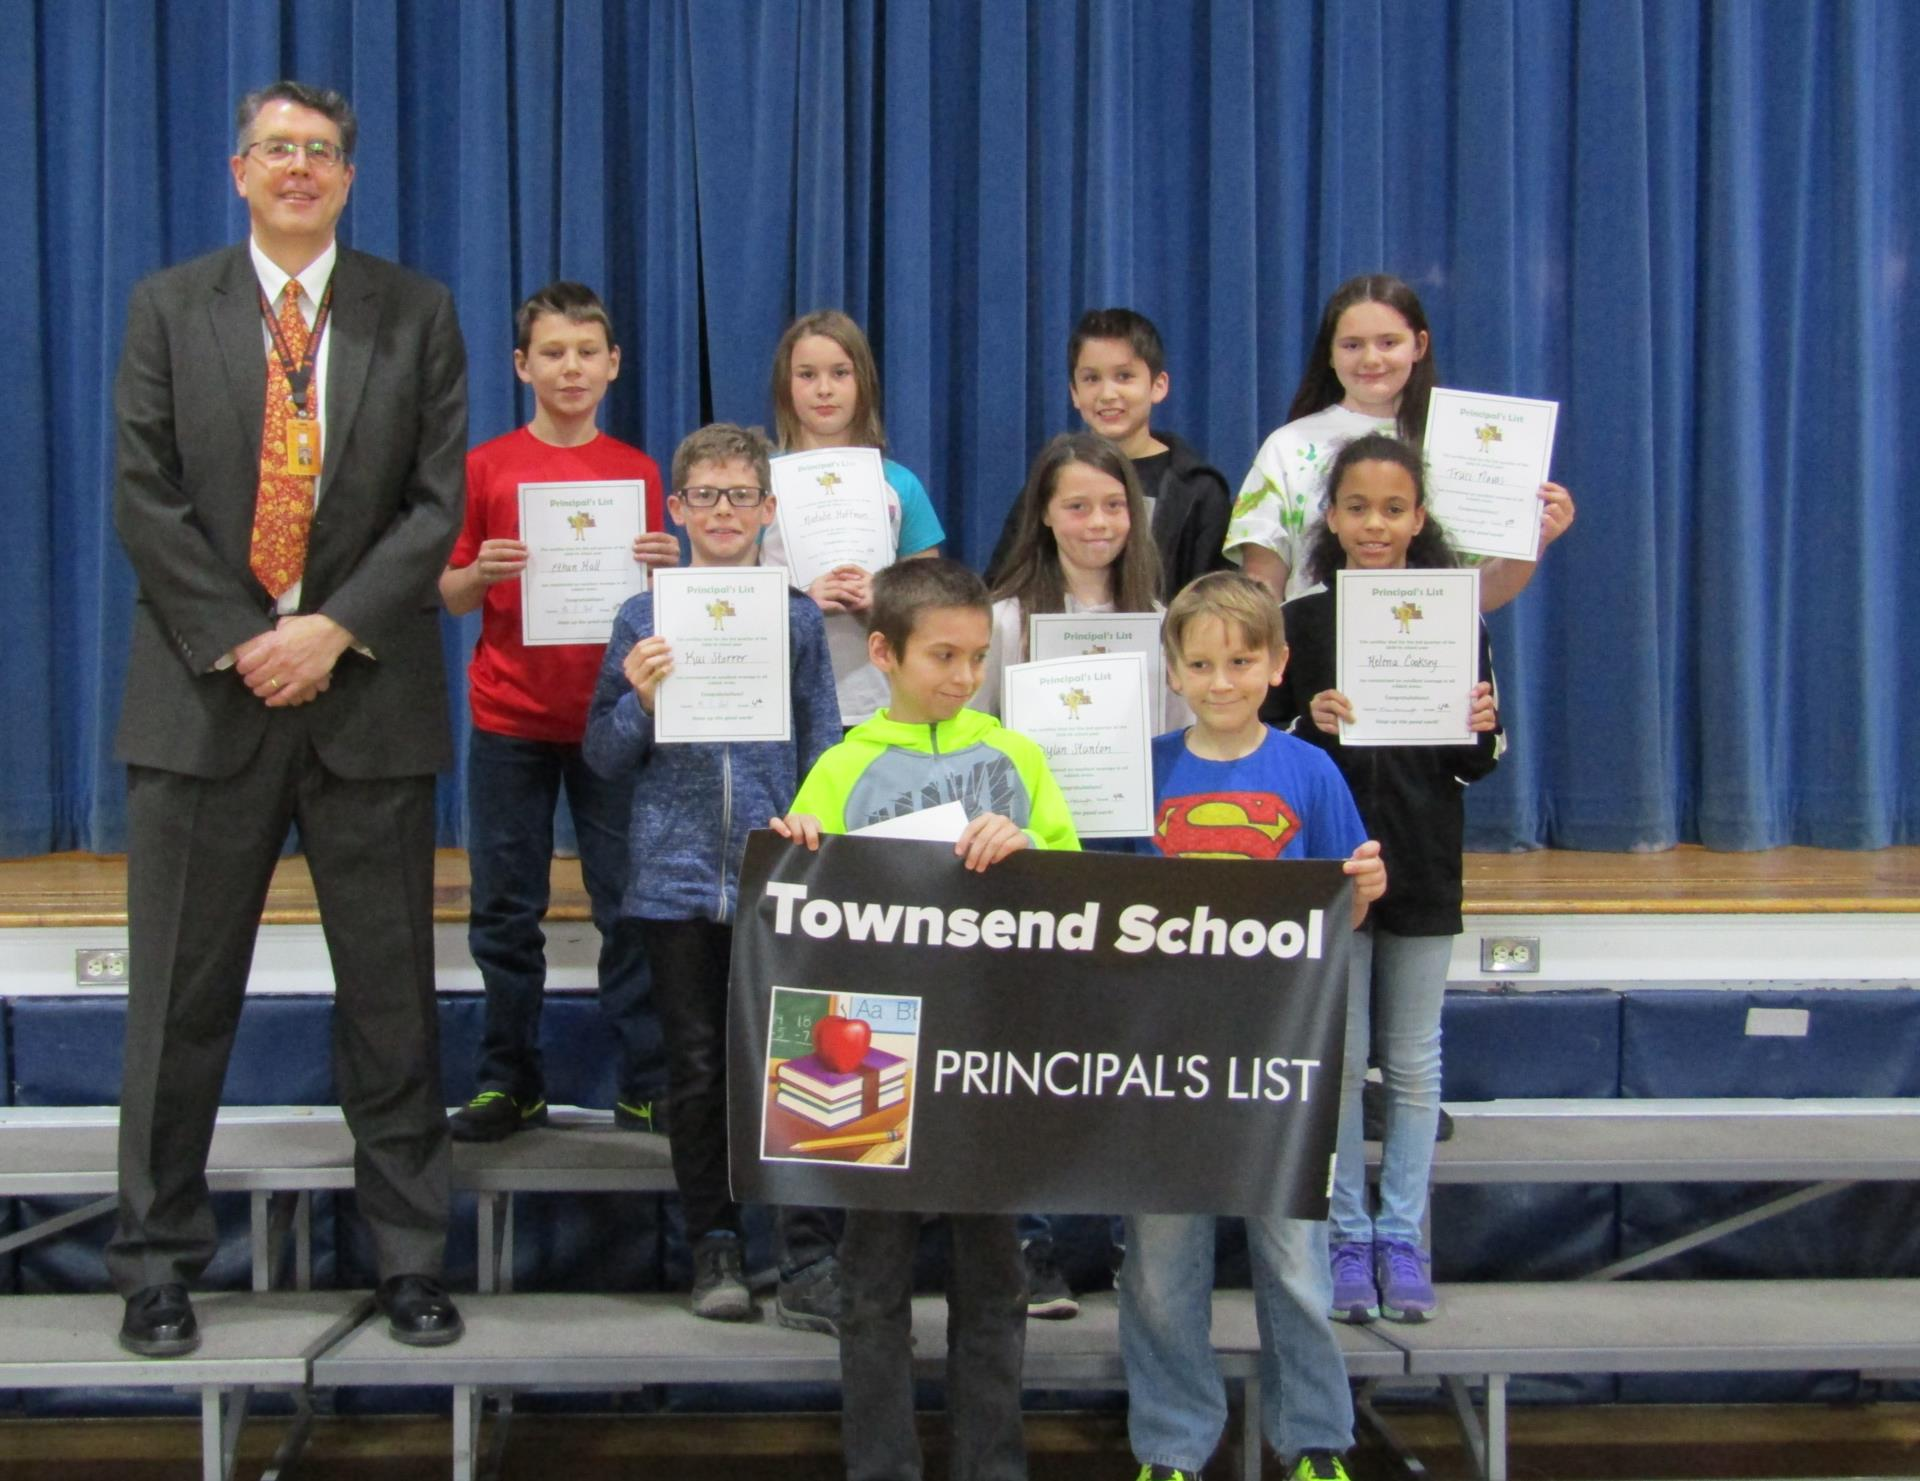 Fifth grade principal's list 3rd quarter 2019